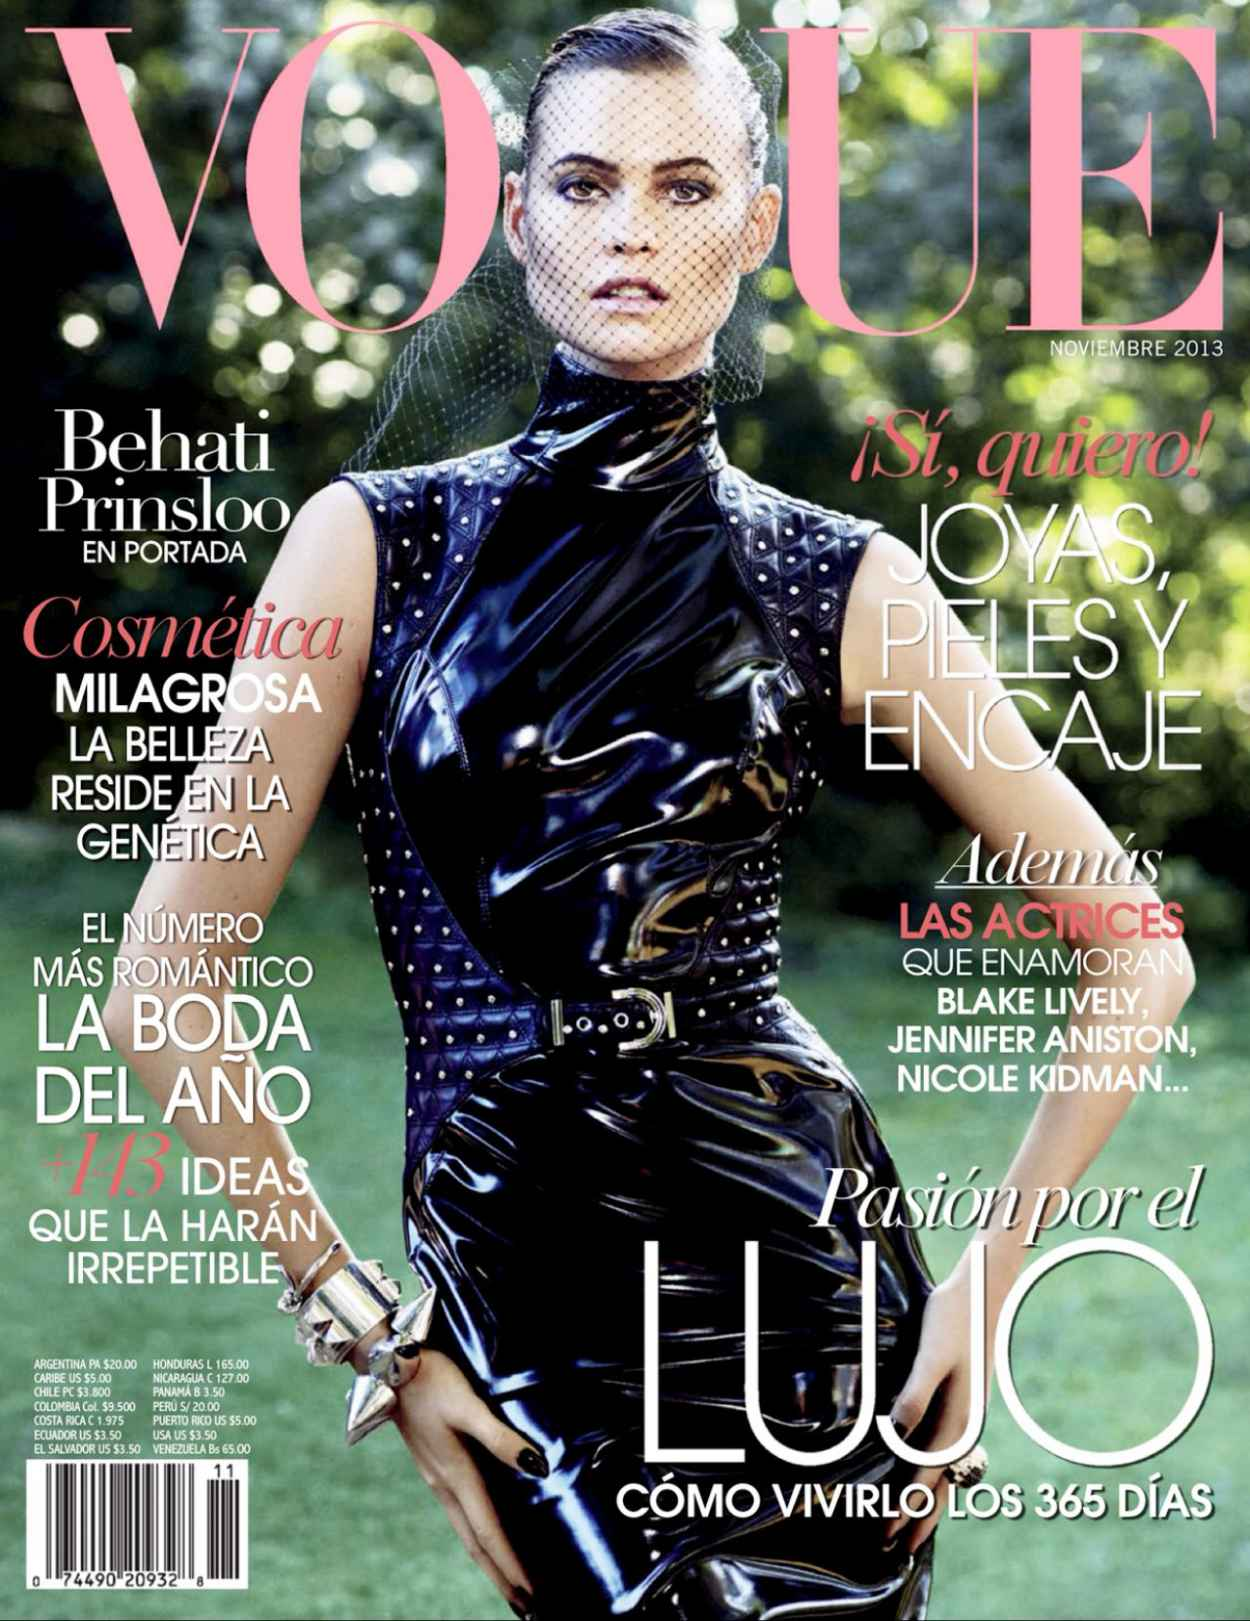 Behati Prinsloo - VOGUE Magazine (Mexico) - November 2015 Issue-2